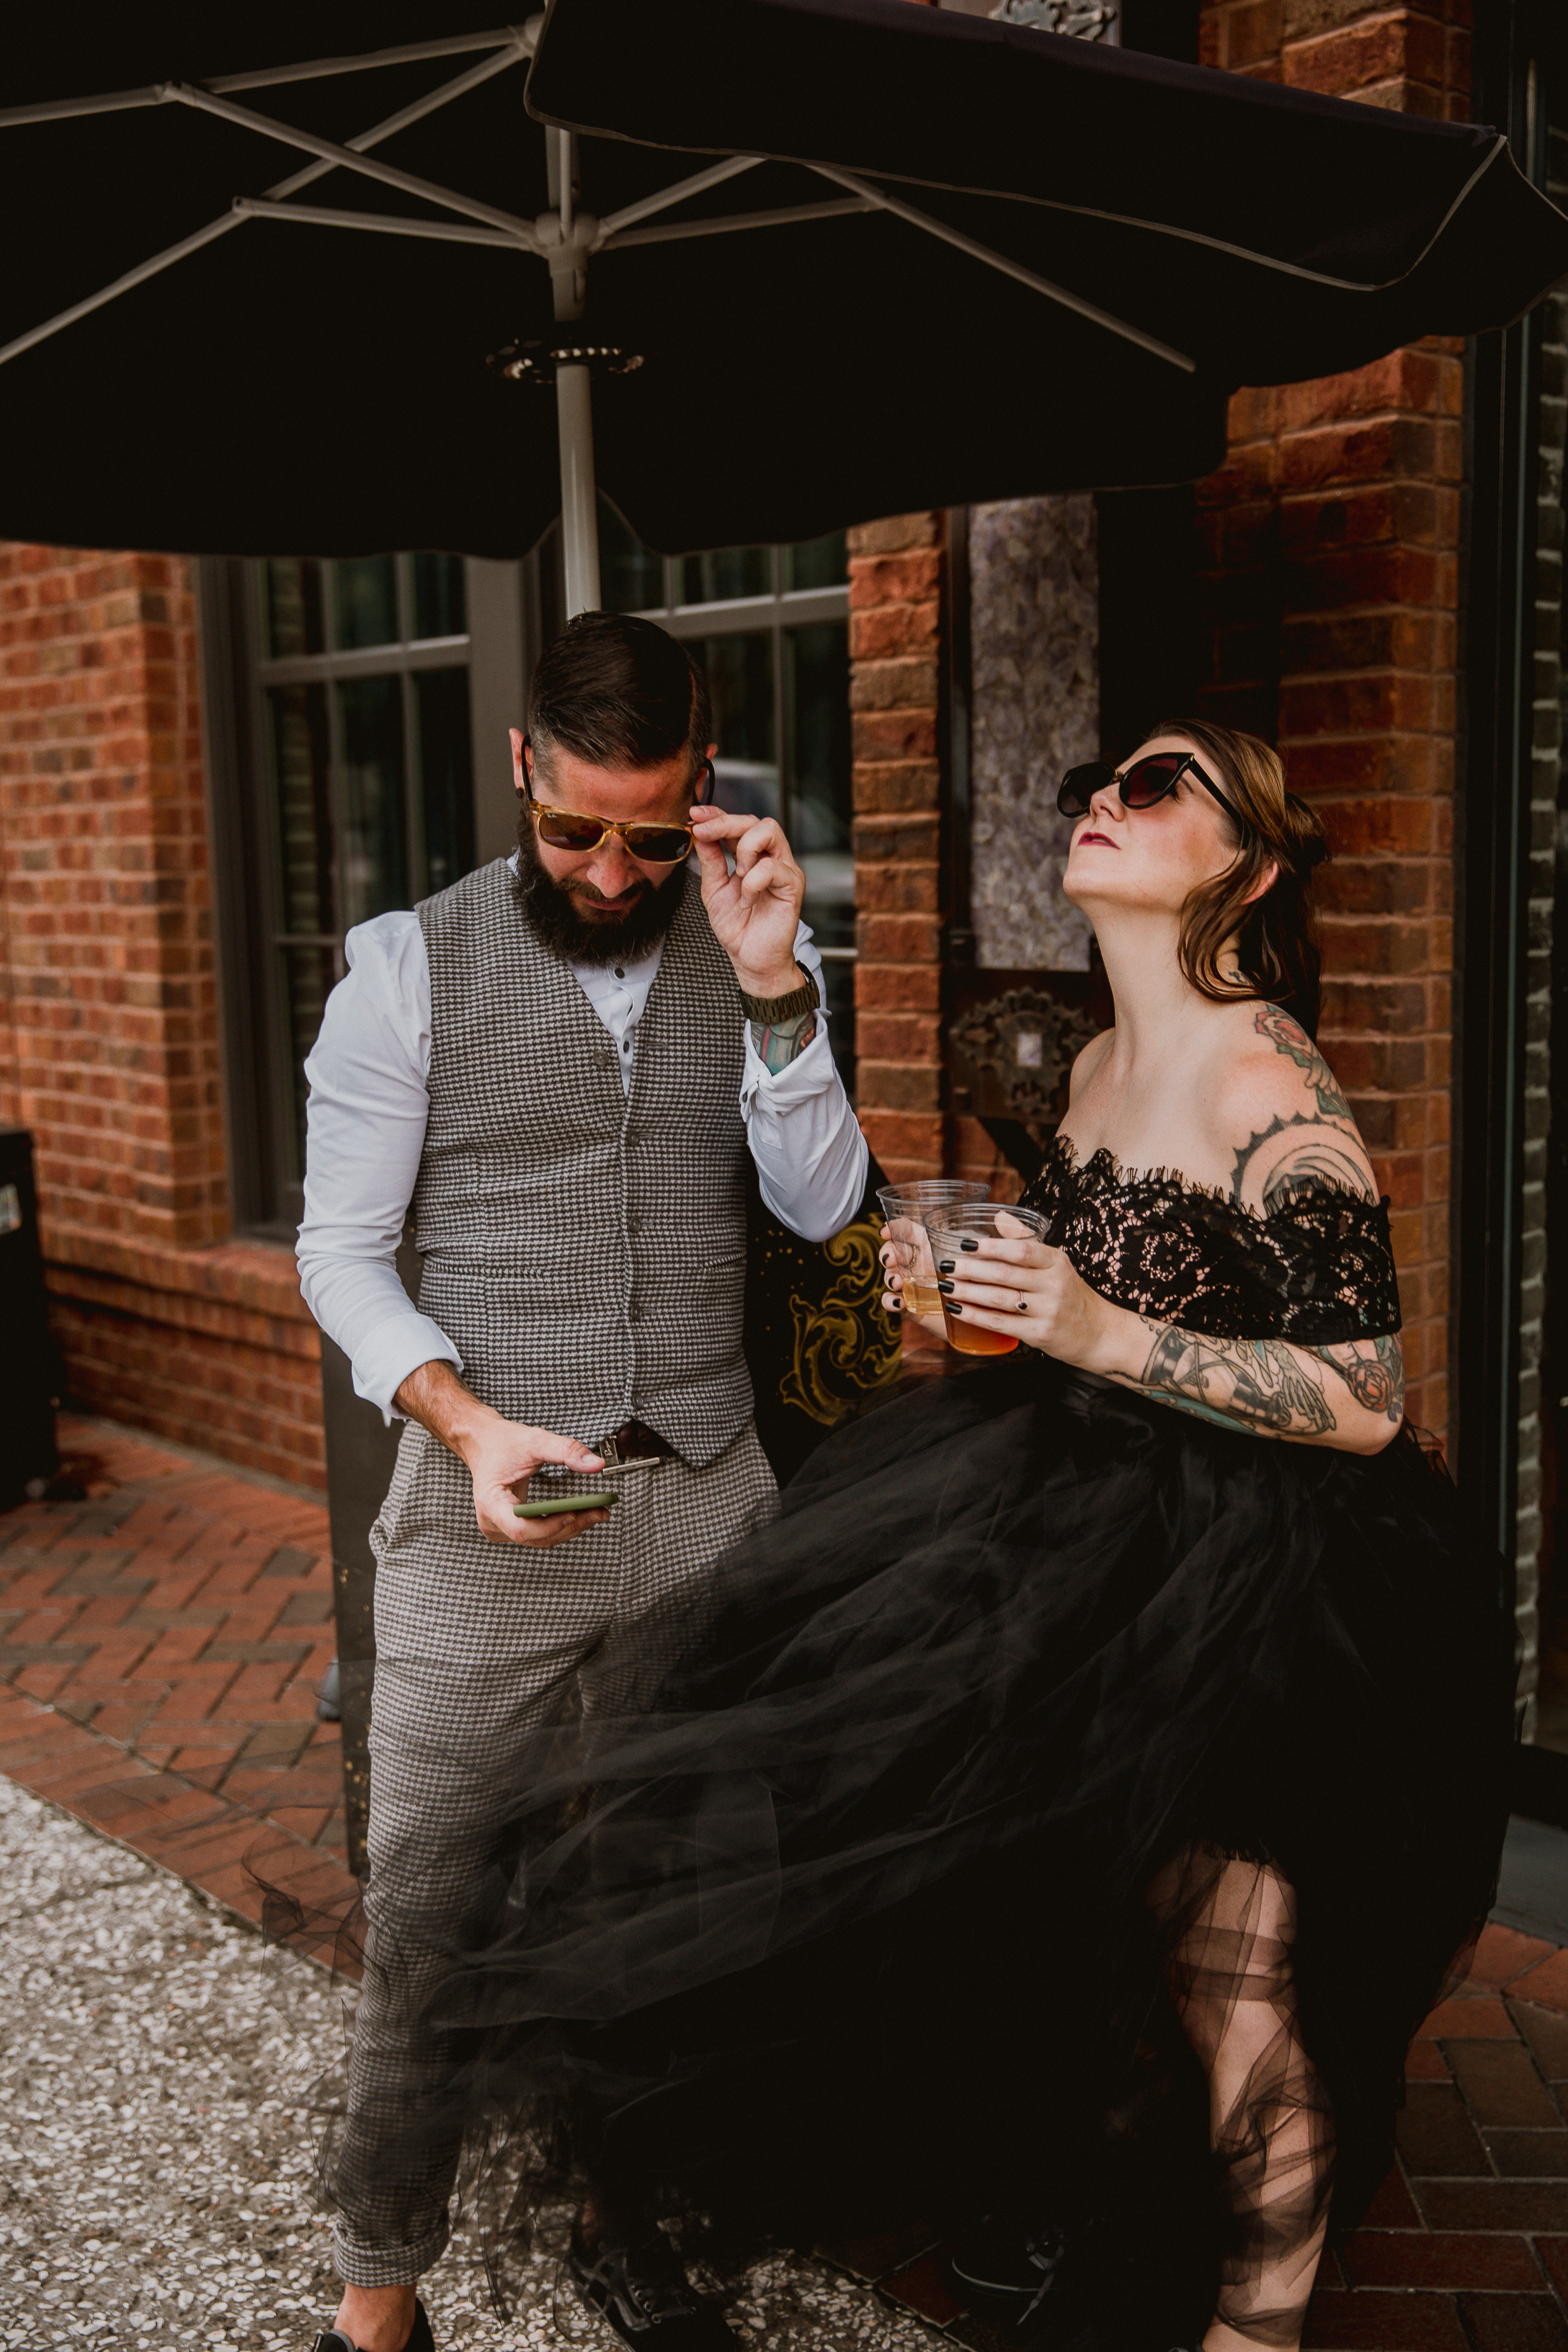 bohemian-hotel-savannah-elopement-kelley-raye-atlanta-wedding-photographer-53.jpg